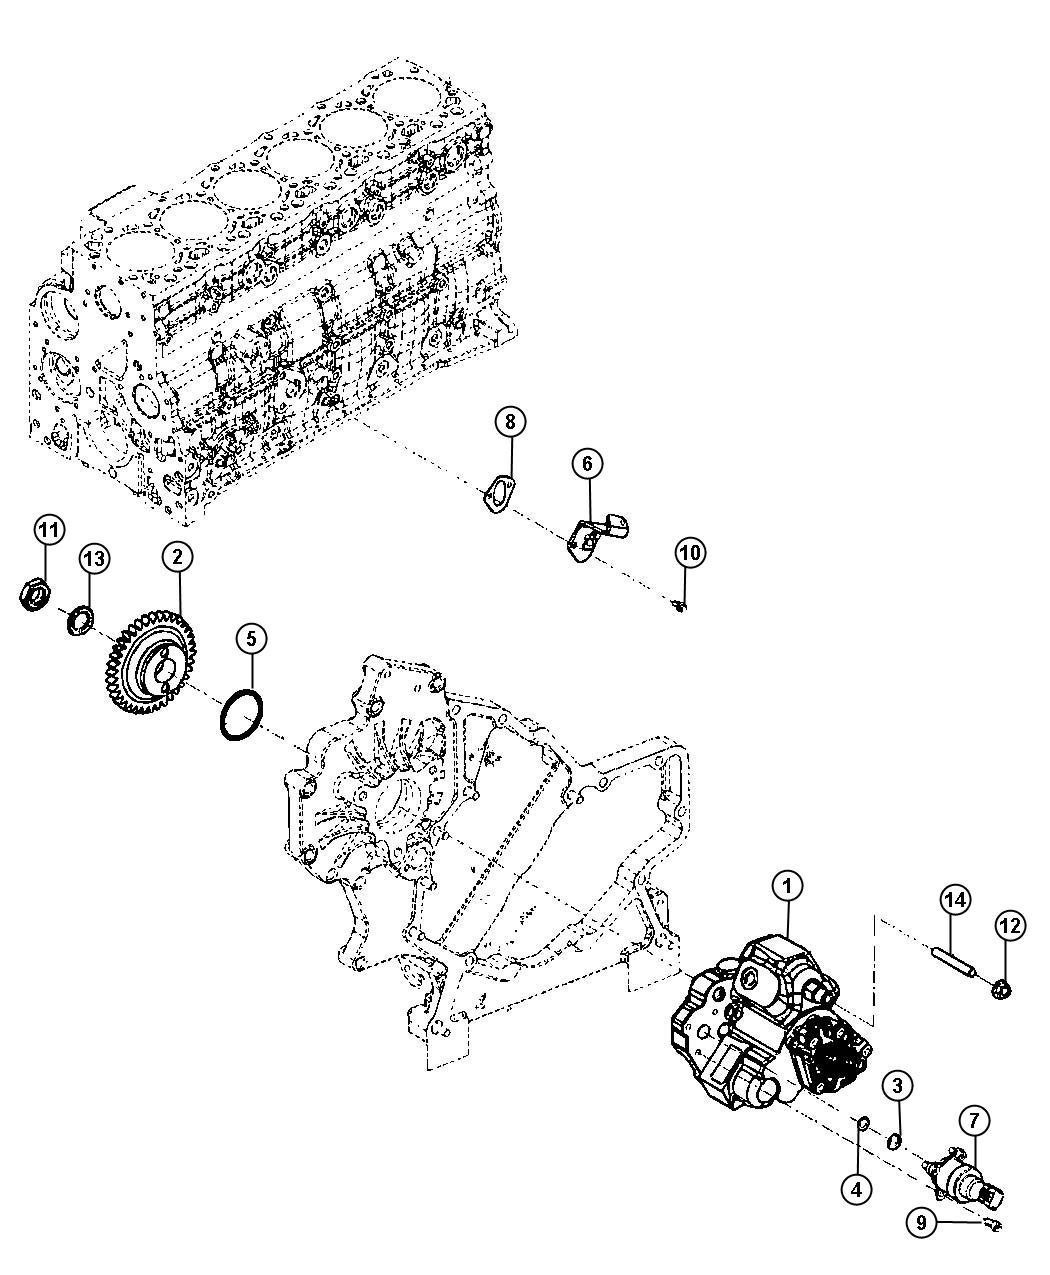 Dodge Ram 2500 Cover. Fuel transfer pump access hole